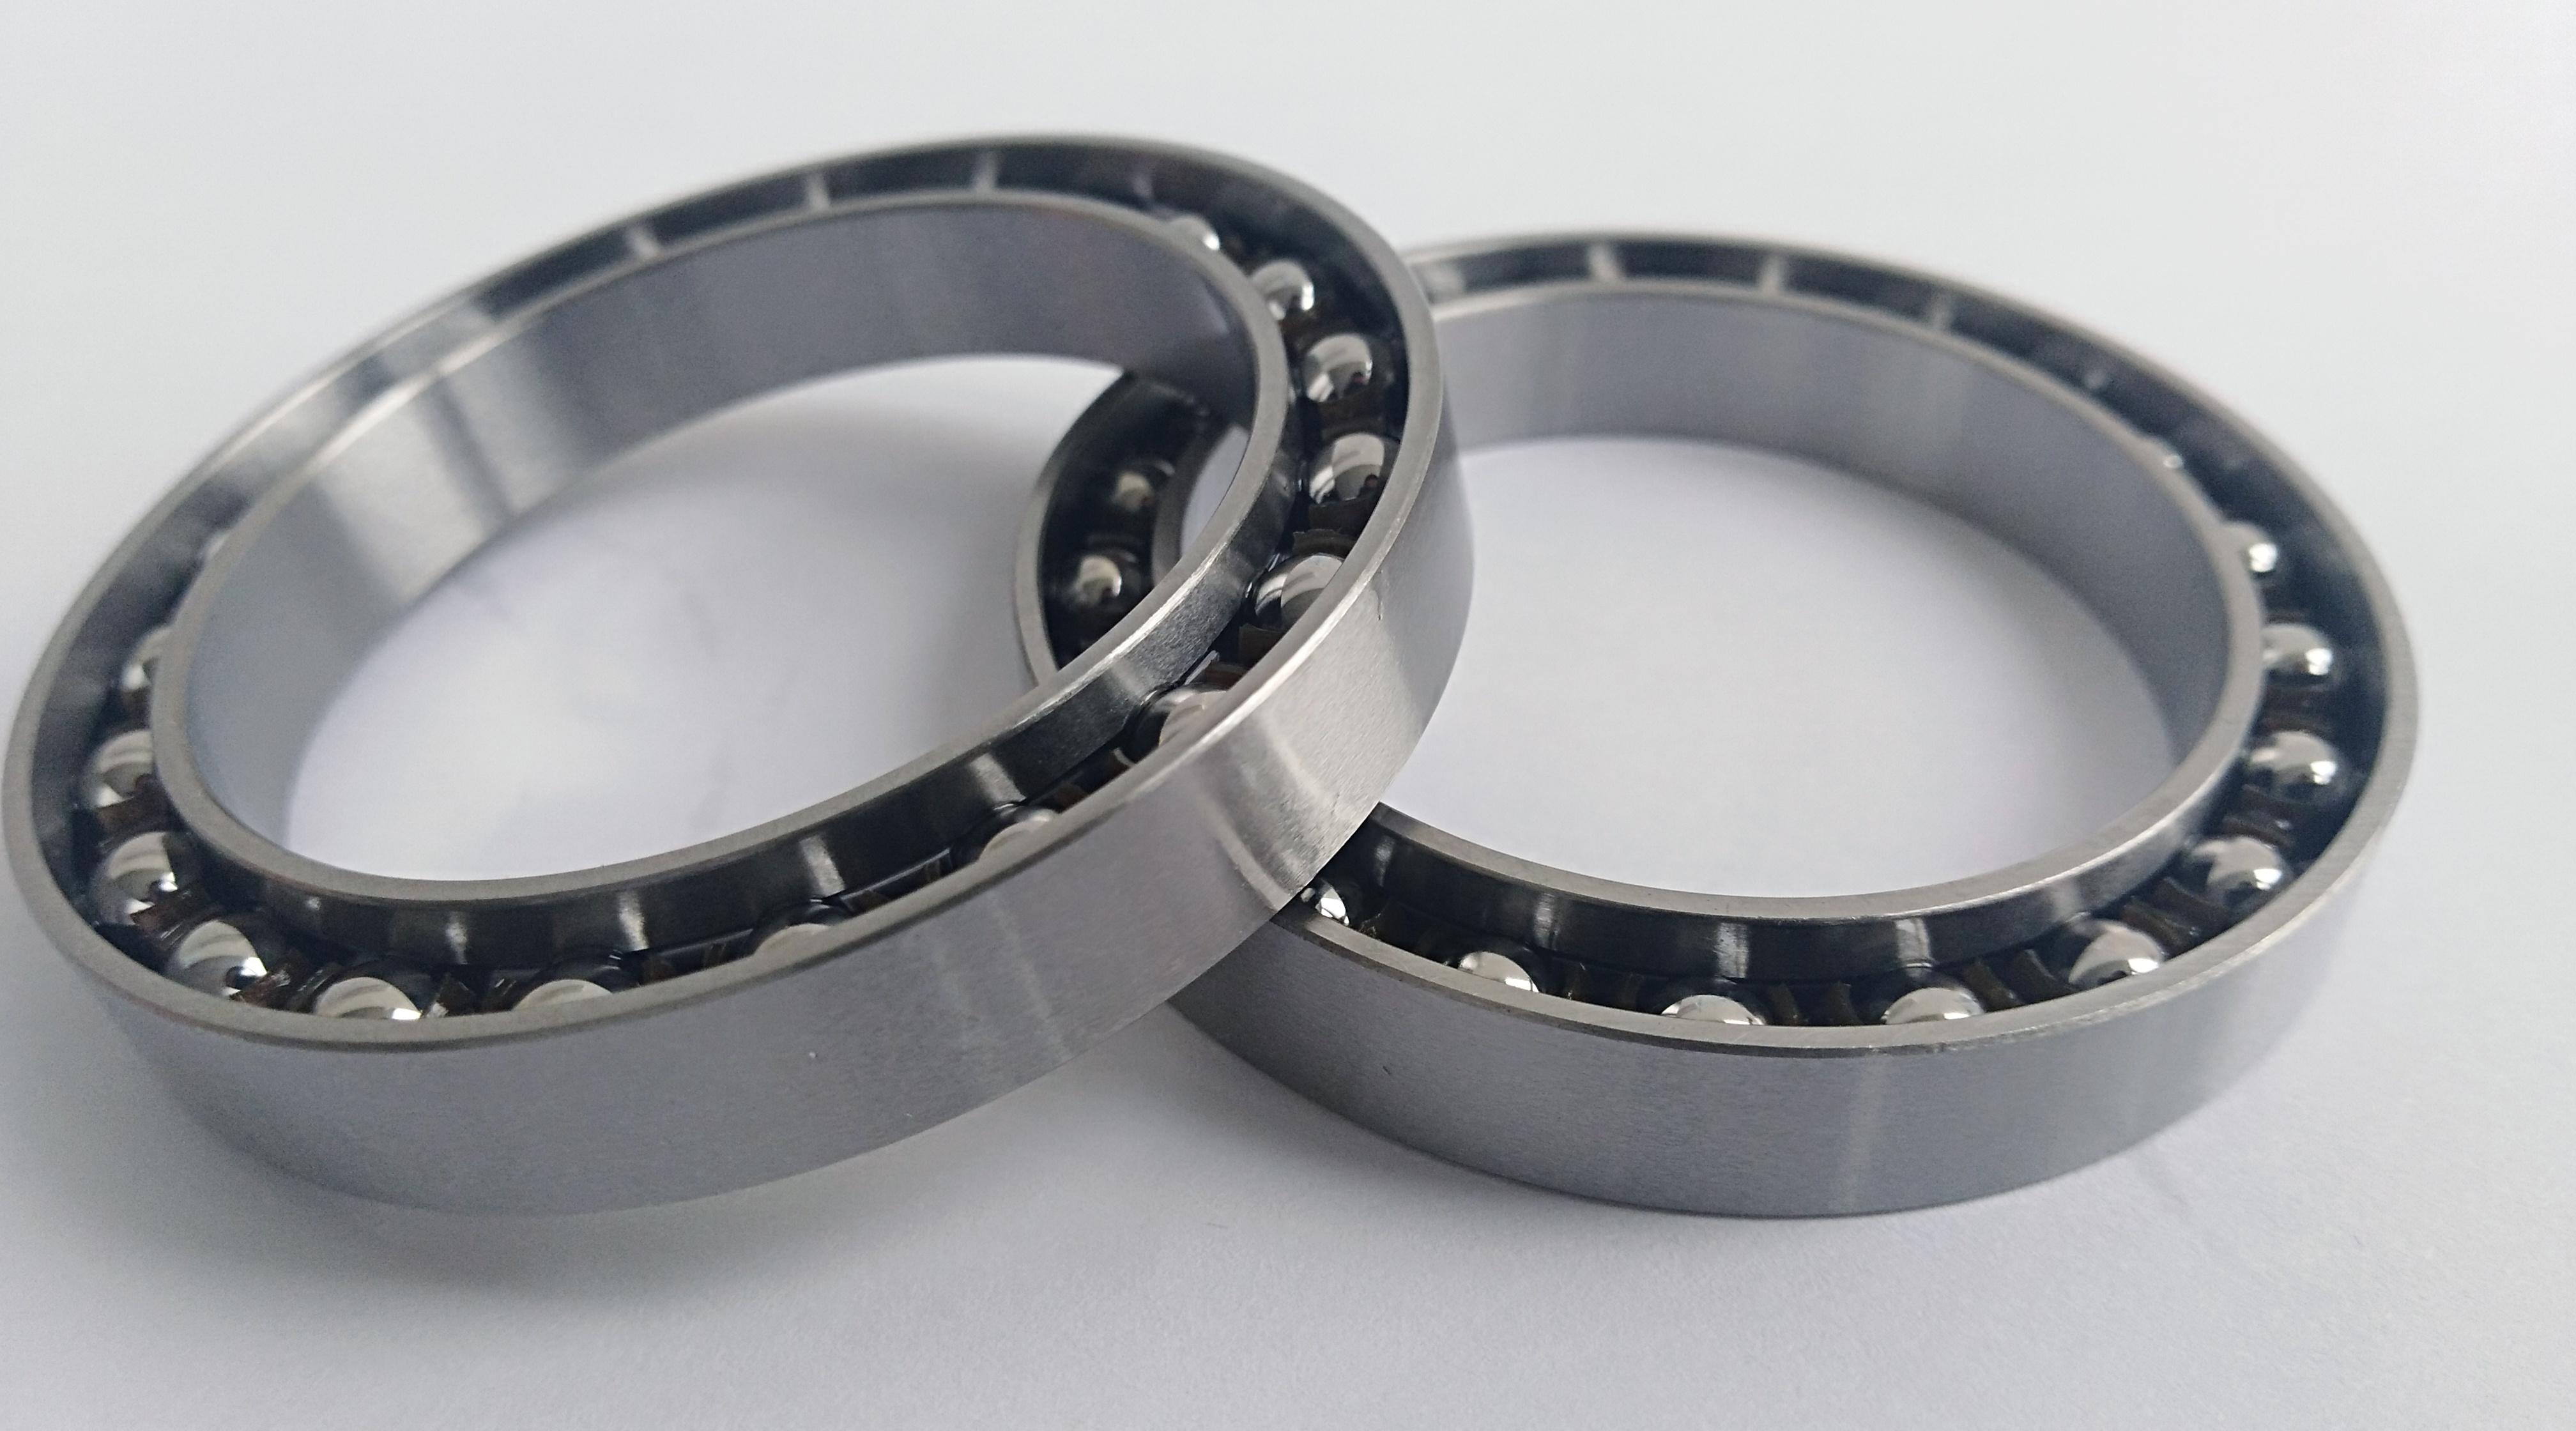 3e809kat2 flexible robot bearing